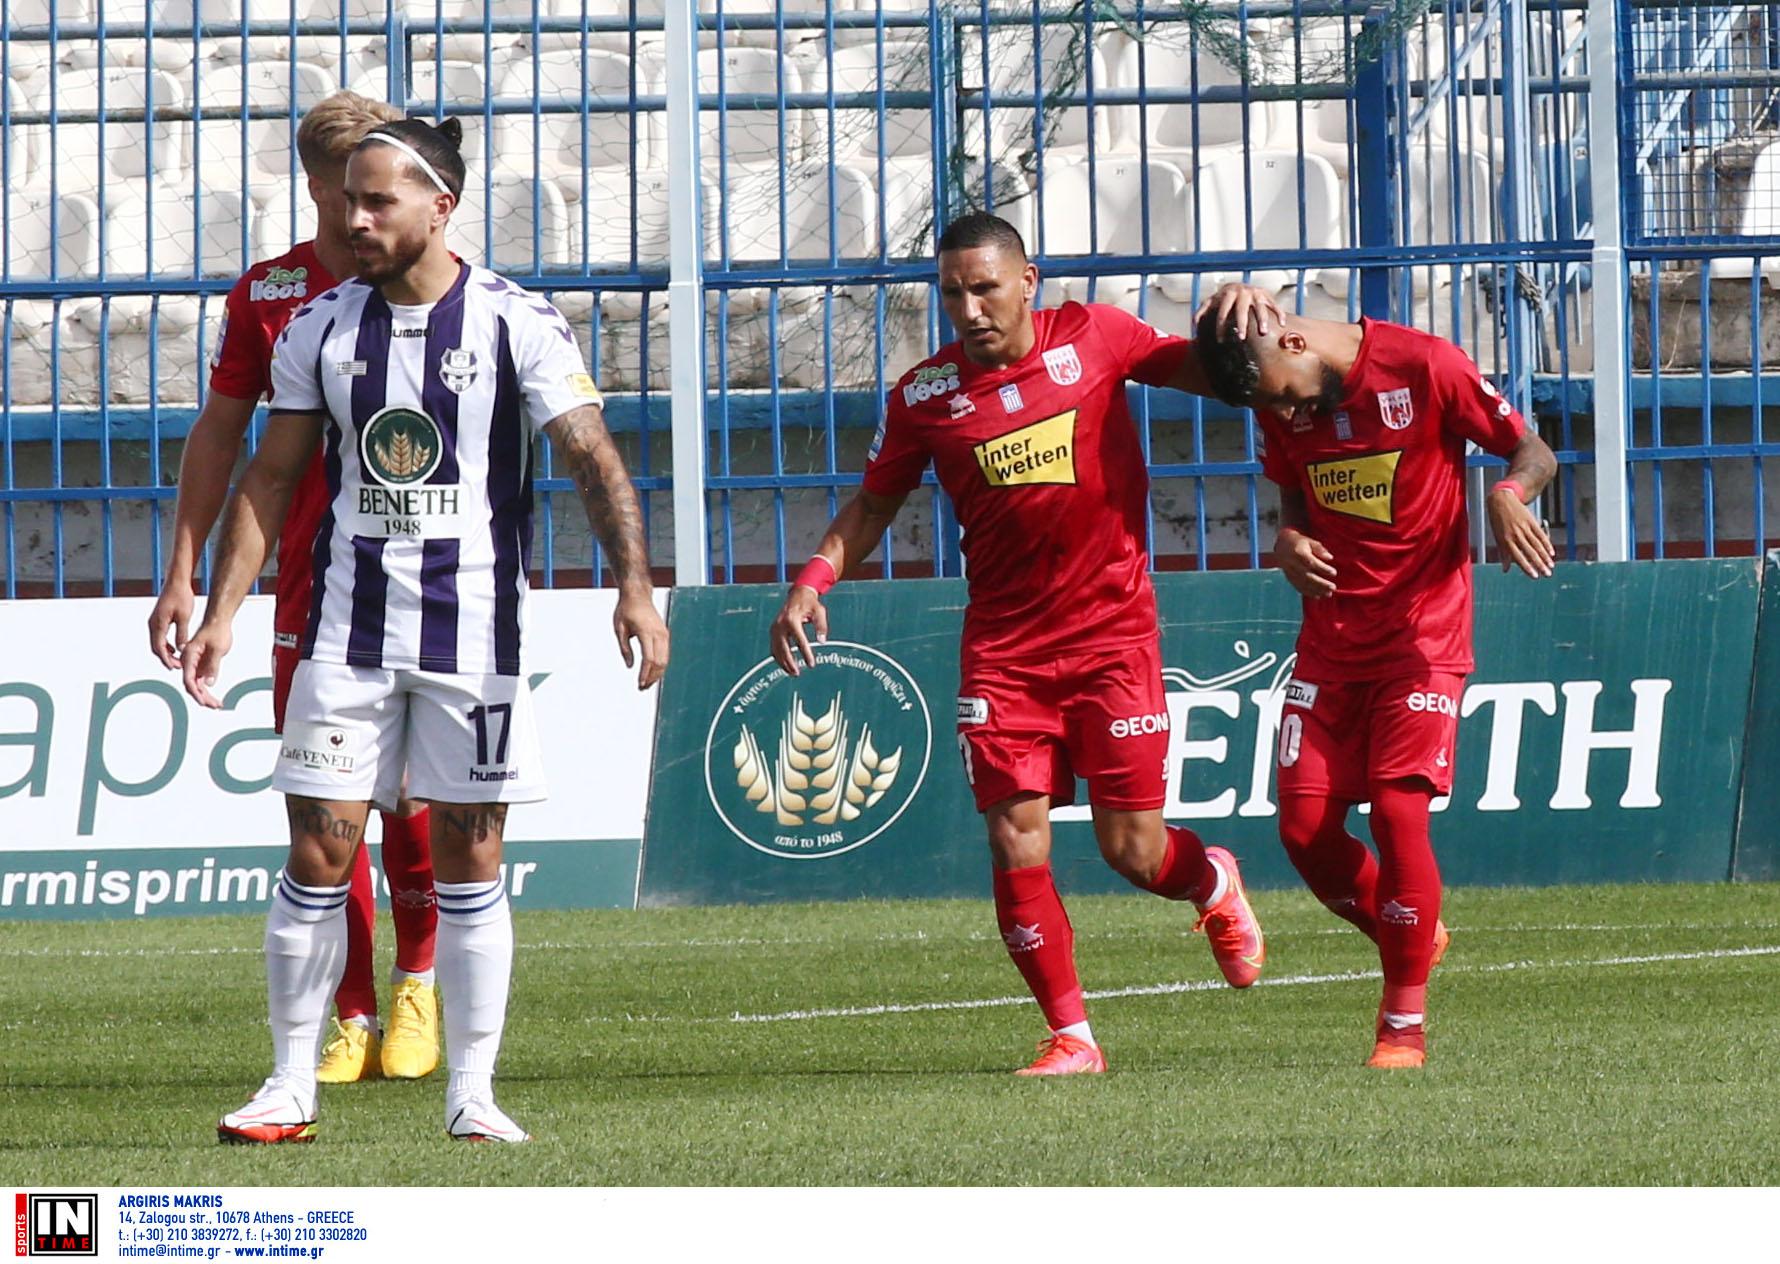 Super League 1, Απόλλων Σμύρνης – Βόλος 1-3: Εντυπωσιακό «διπλό» πρωτιάς